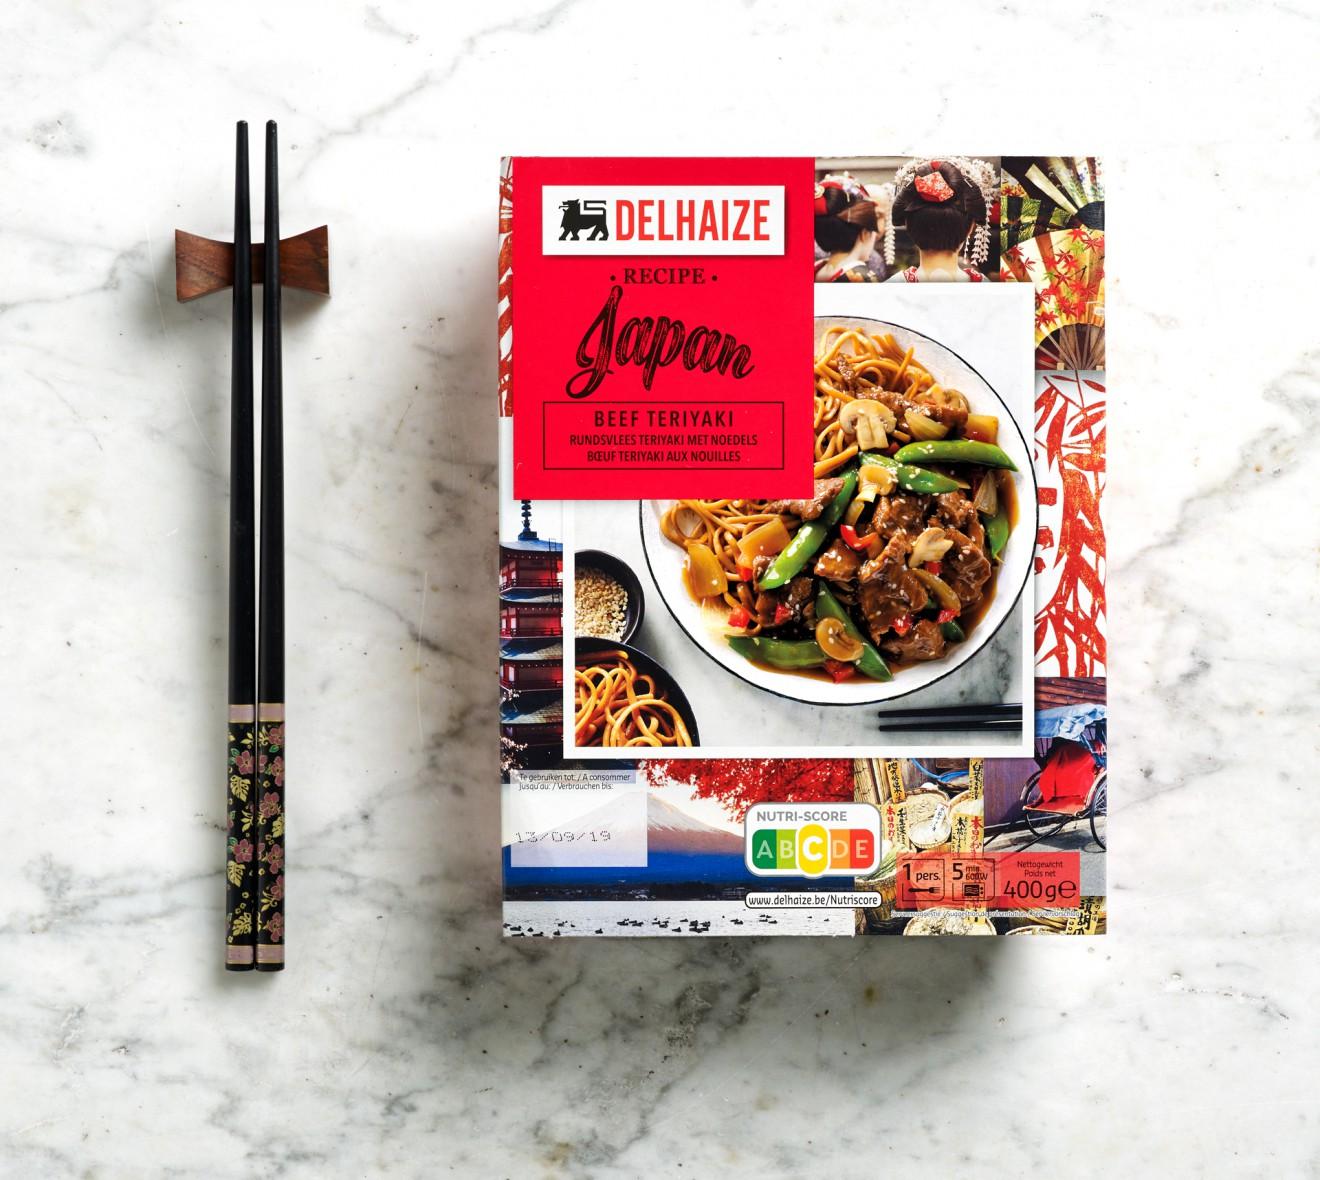 Quatre Mains package design - japan, beef teriyaki, rice